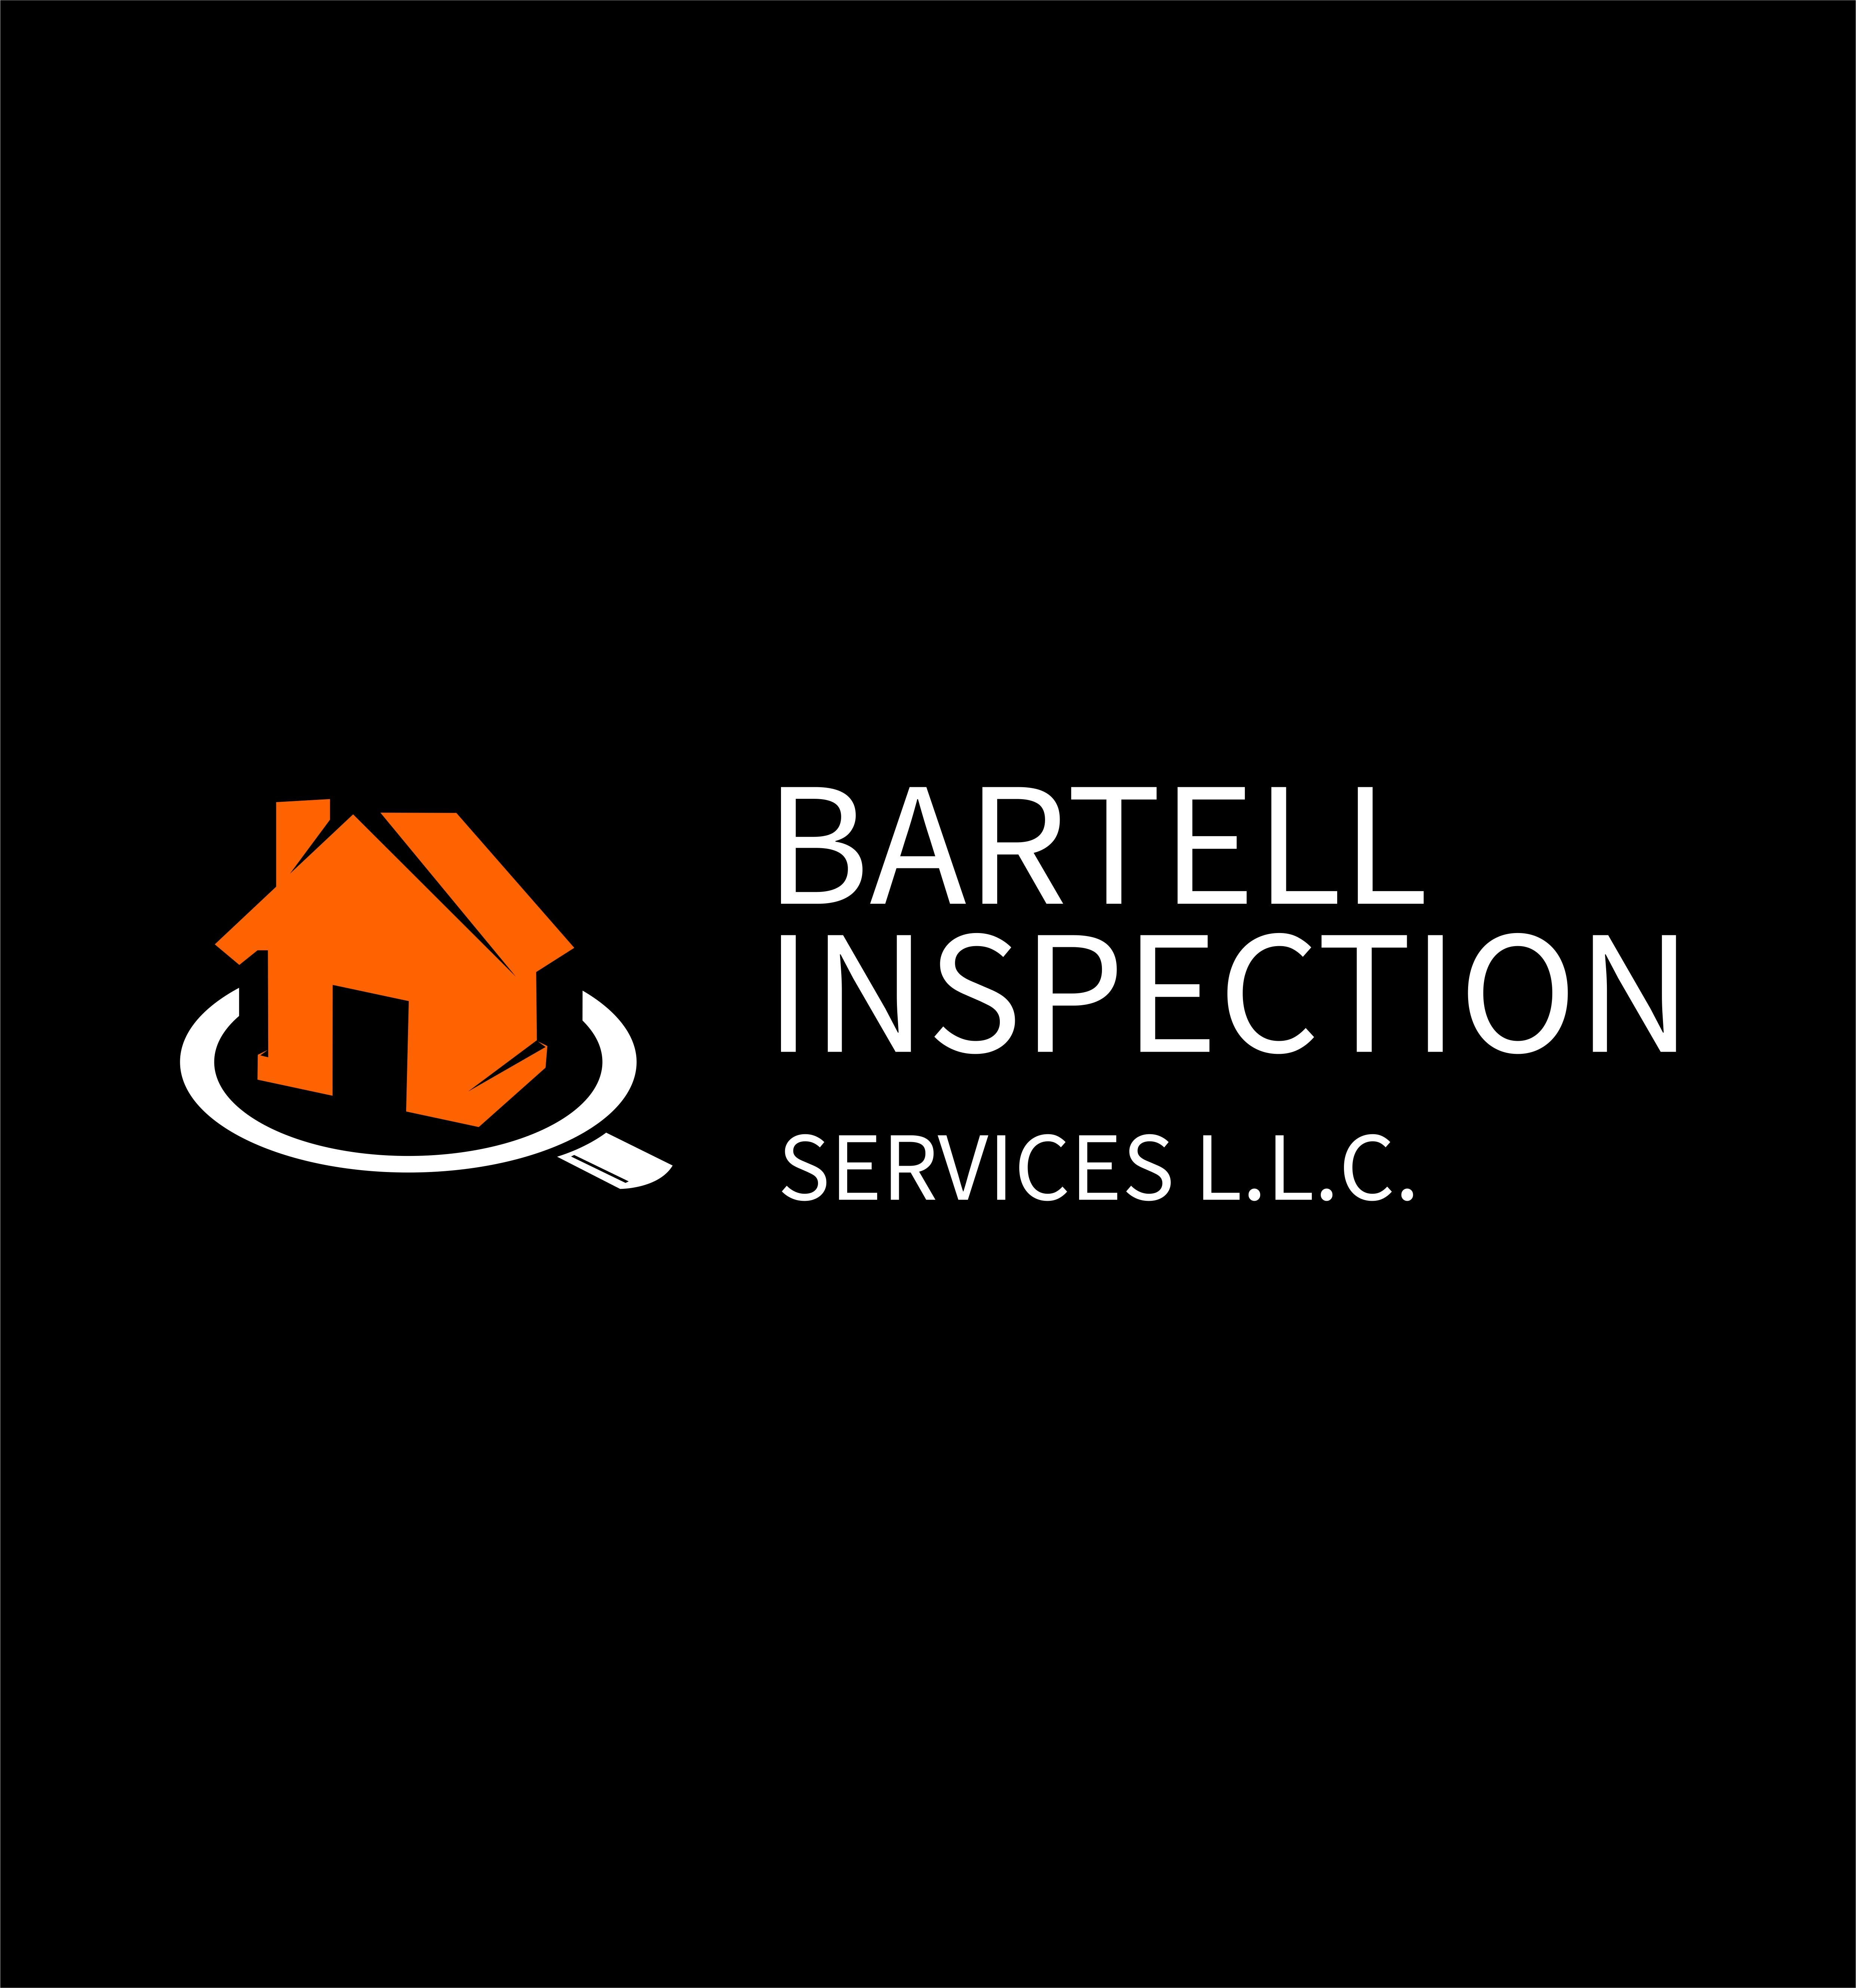 Bartell Inspection Services LLC logo